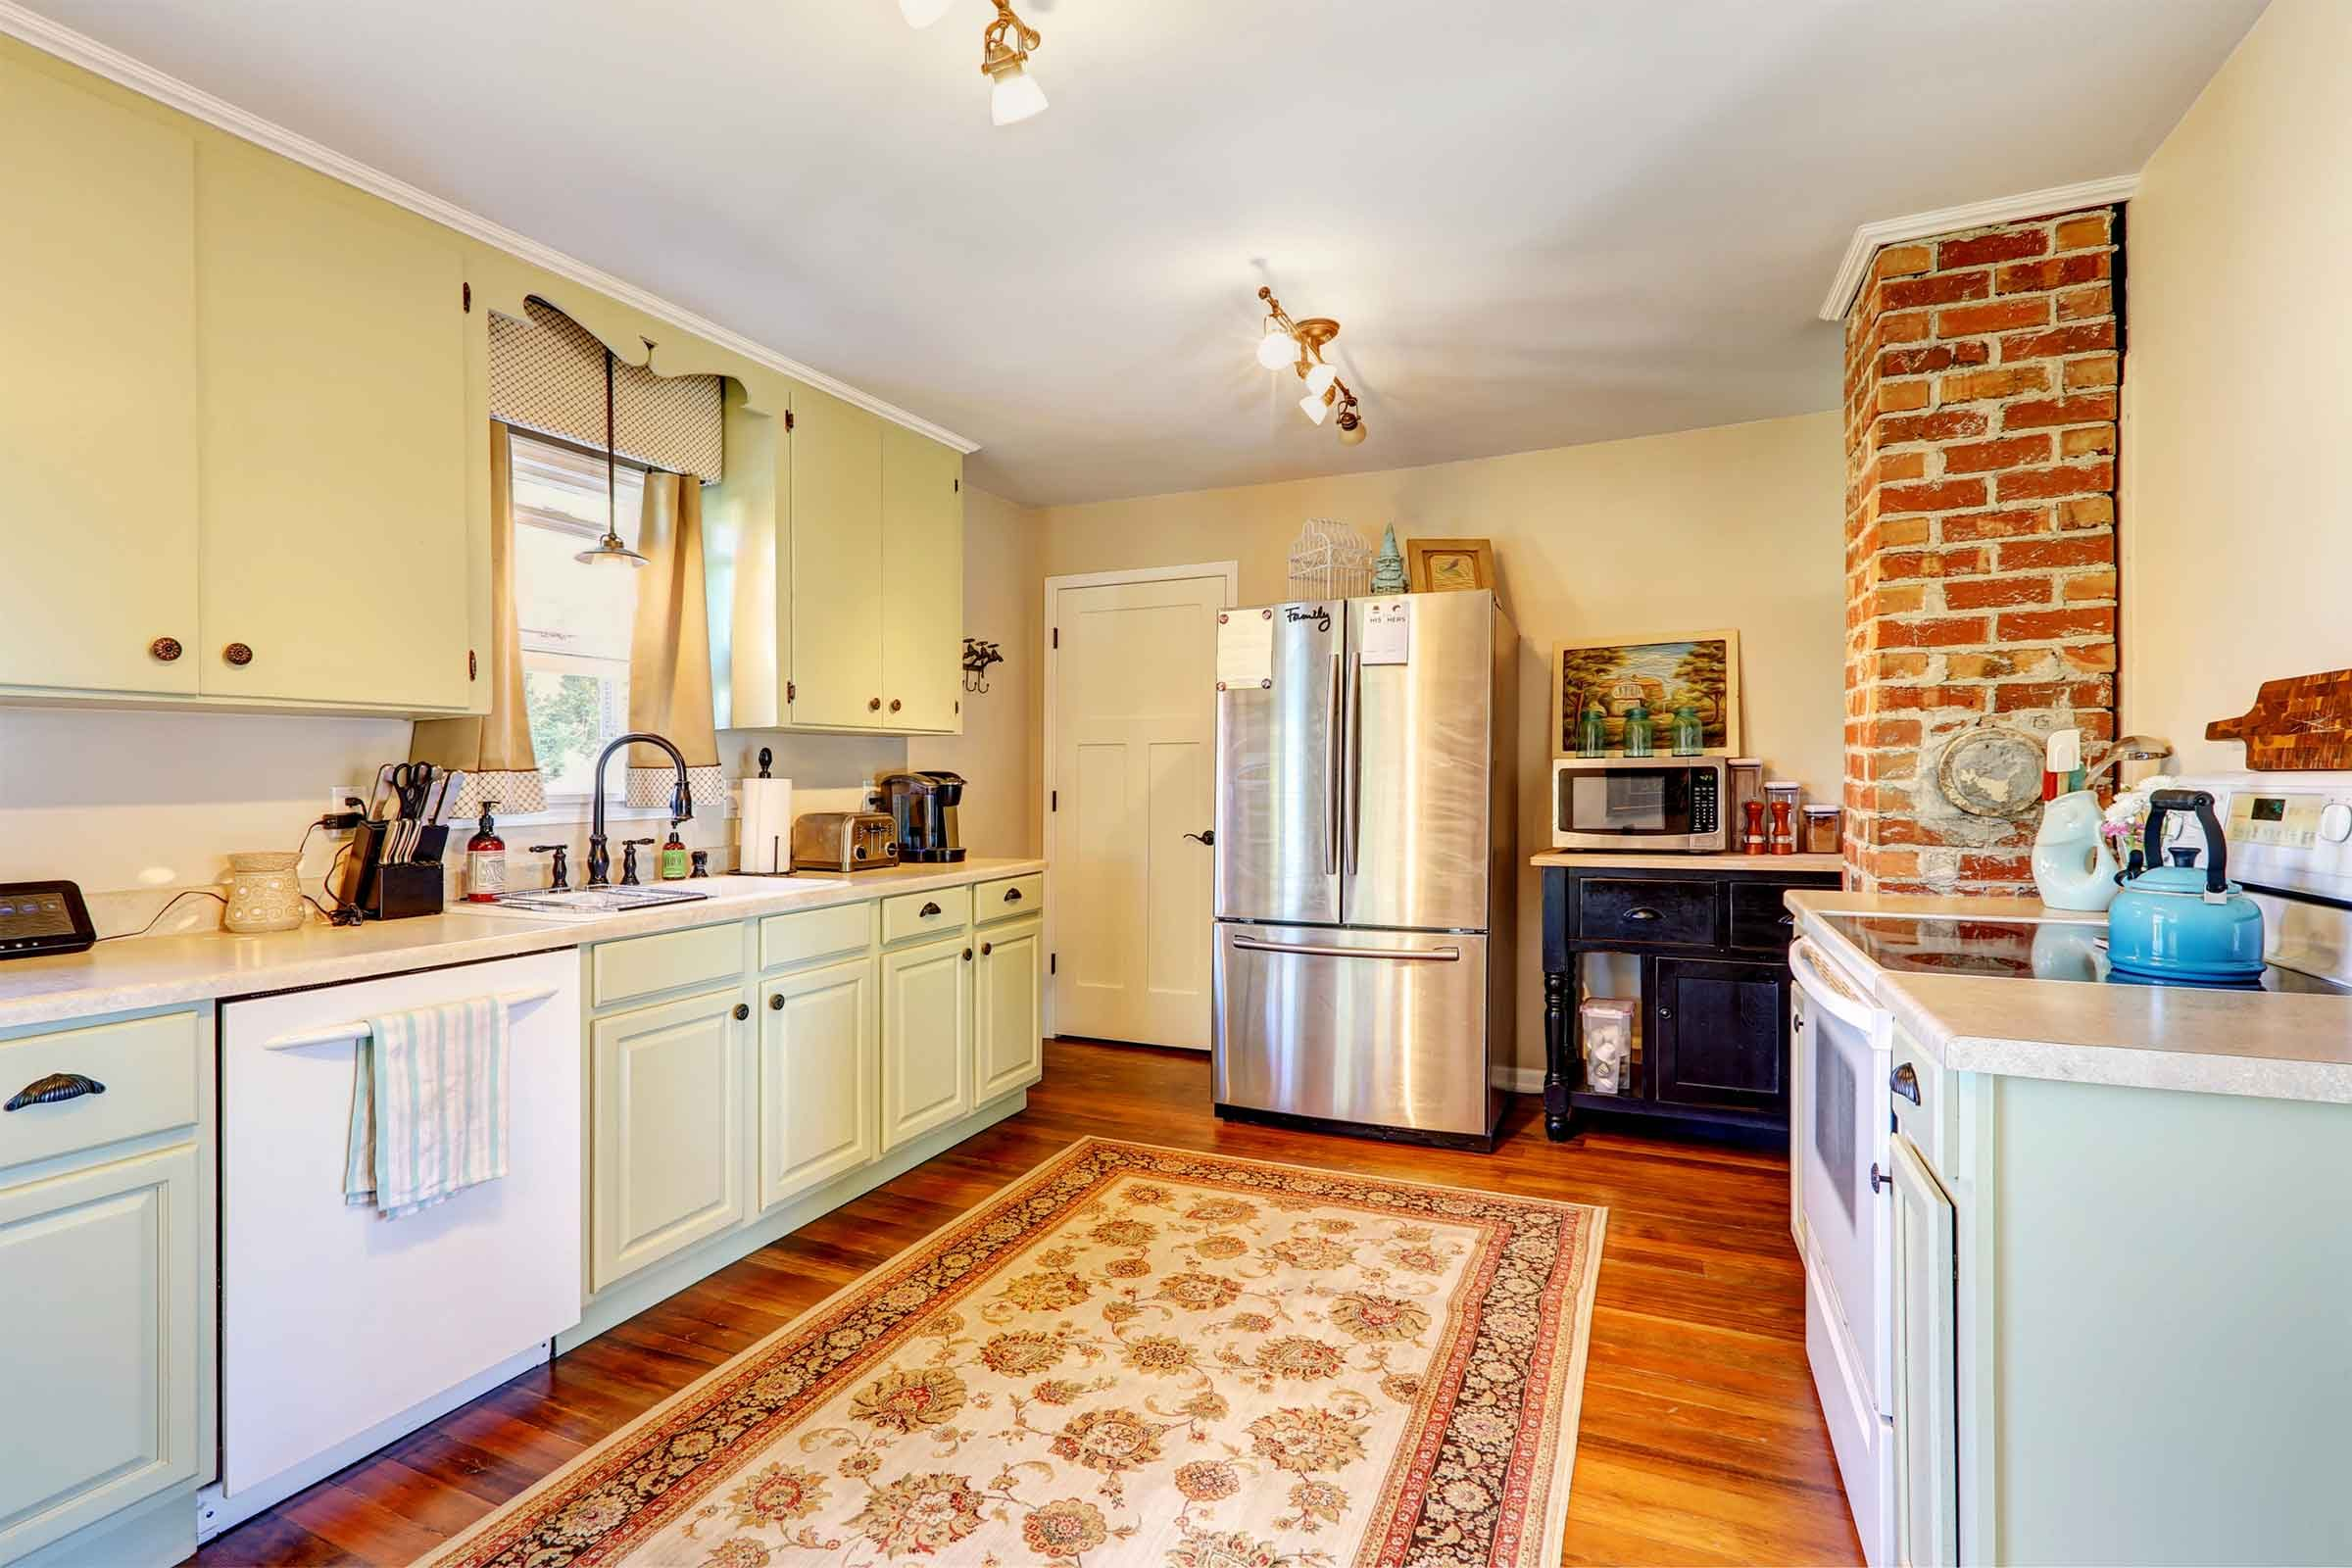 Kitchen Design Ideas that Look Expensive